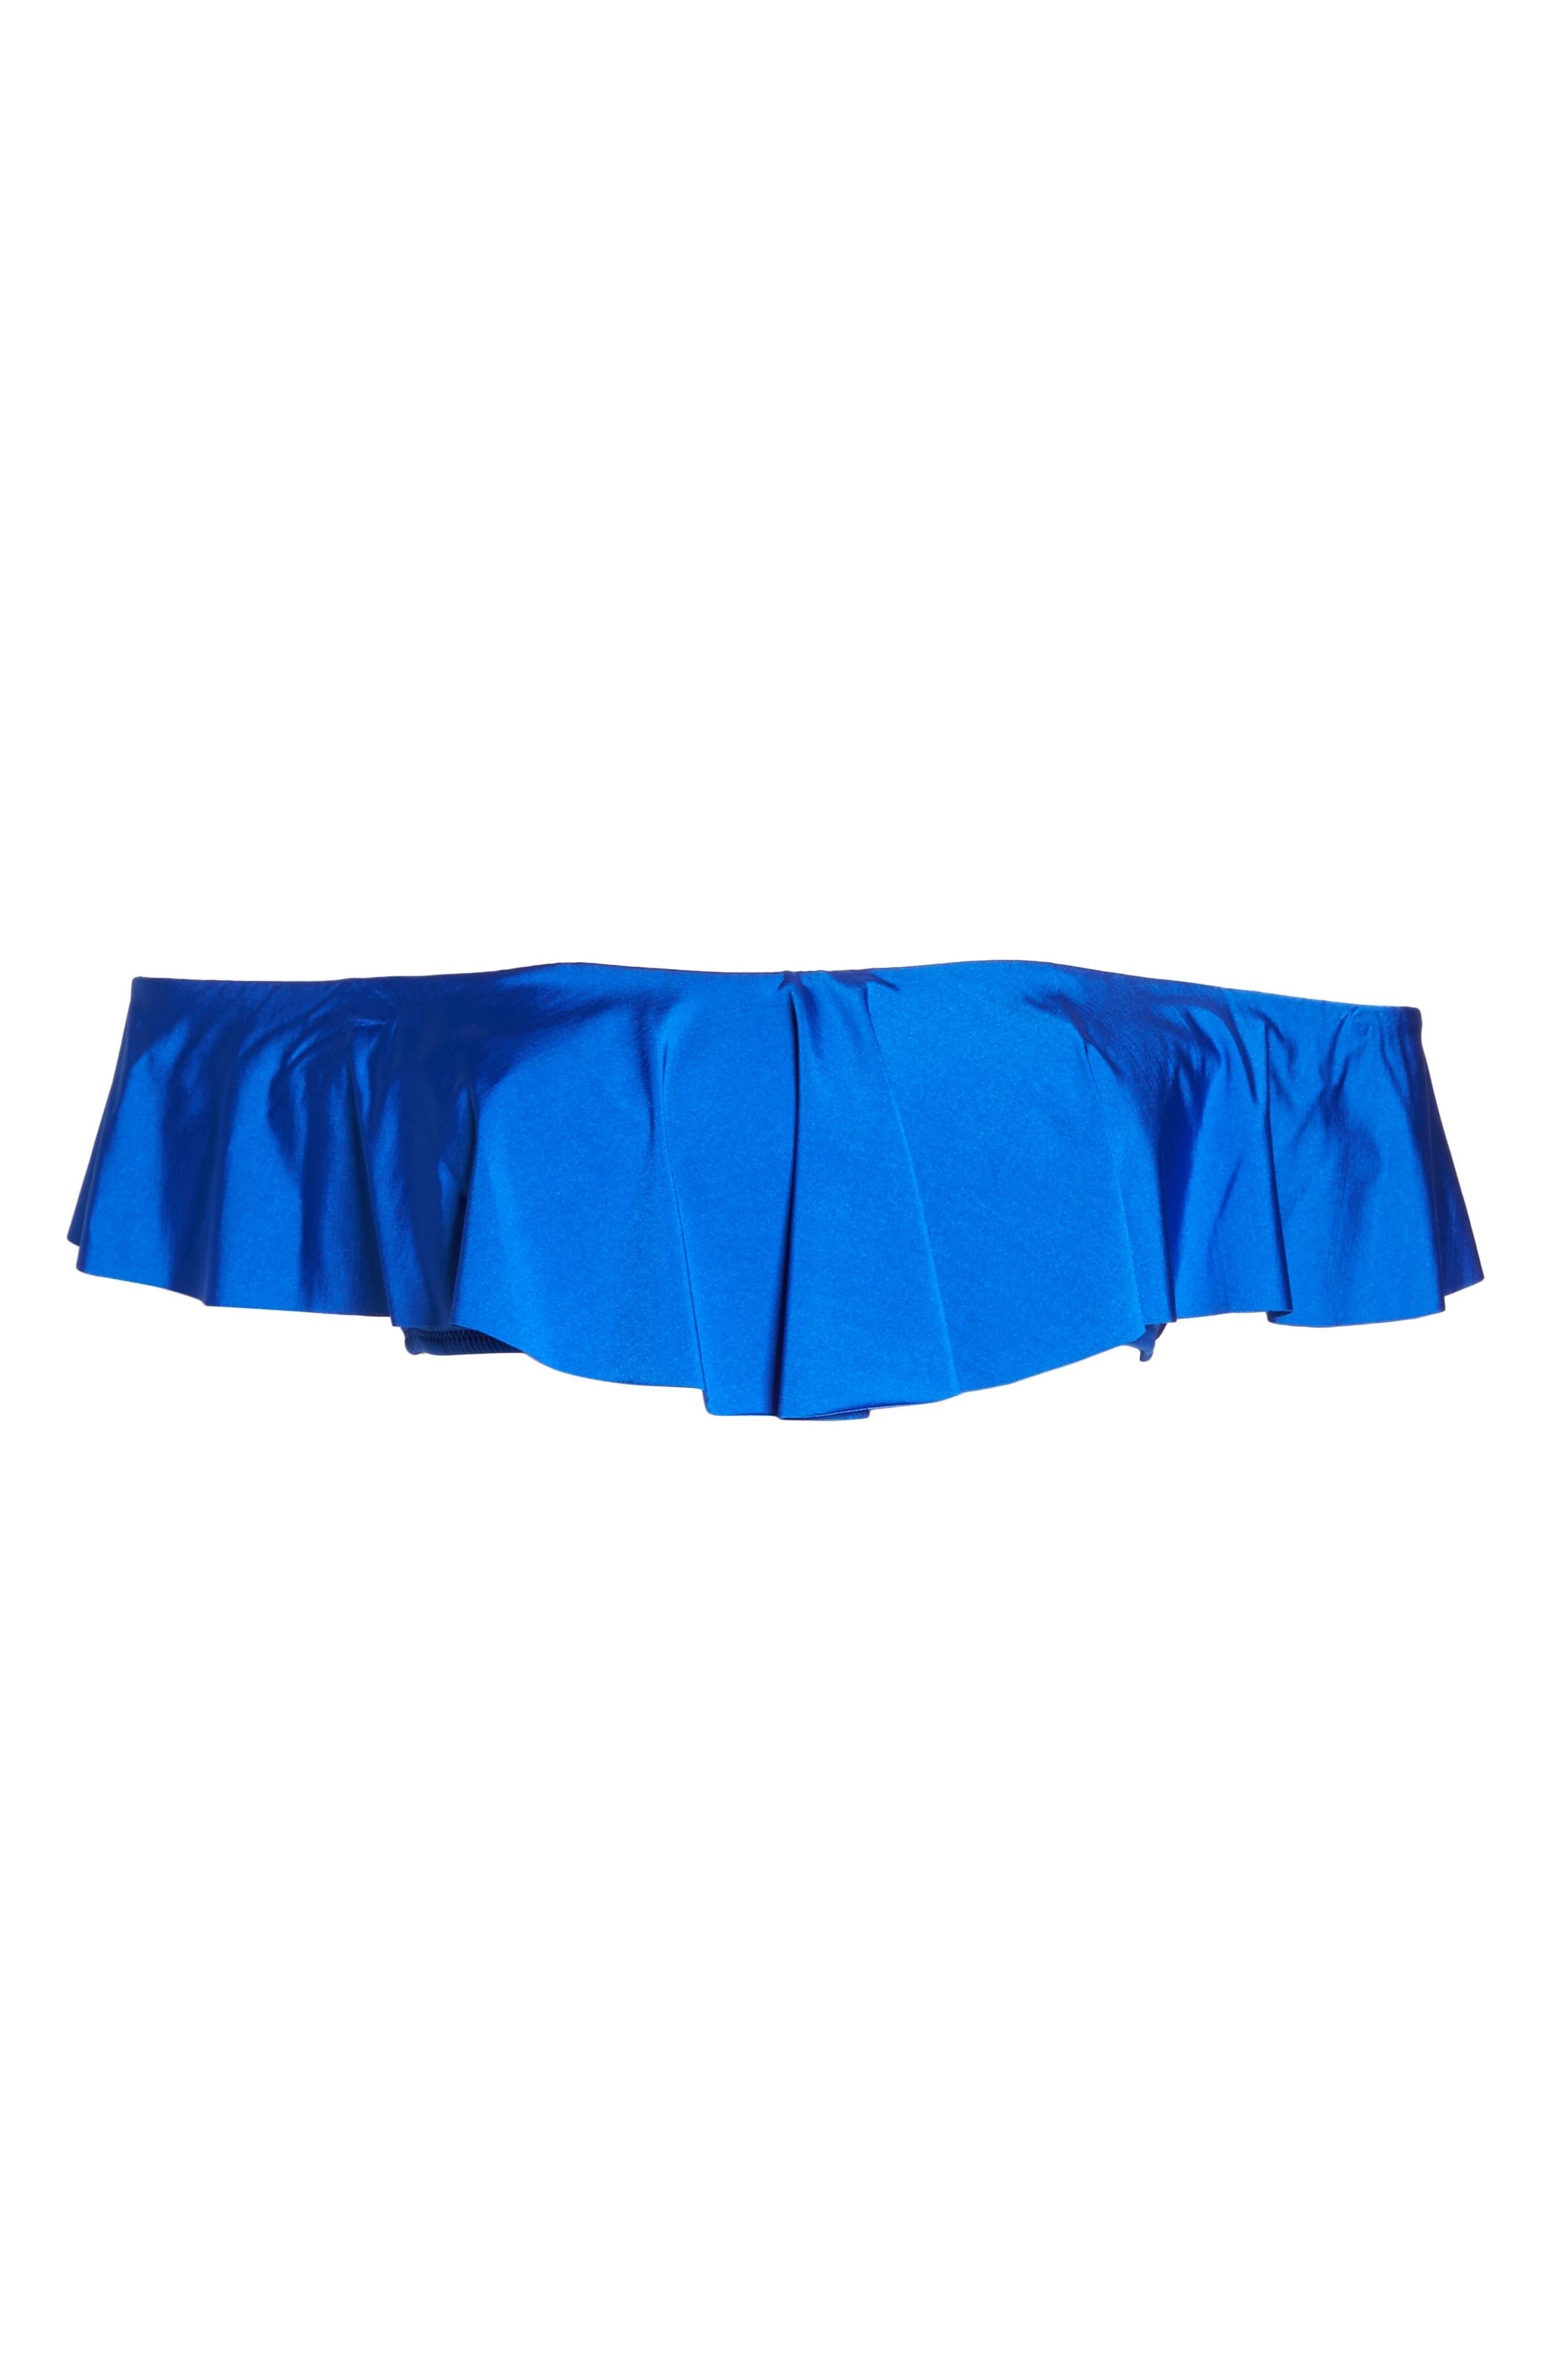 Flutter Bandeau Bikini Top,                             Alternate thumbnail 4, color,                             Sap